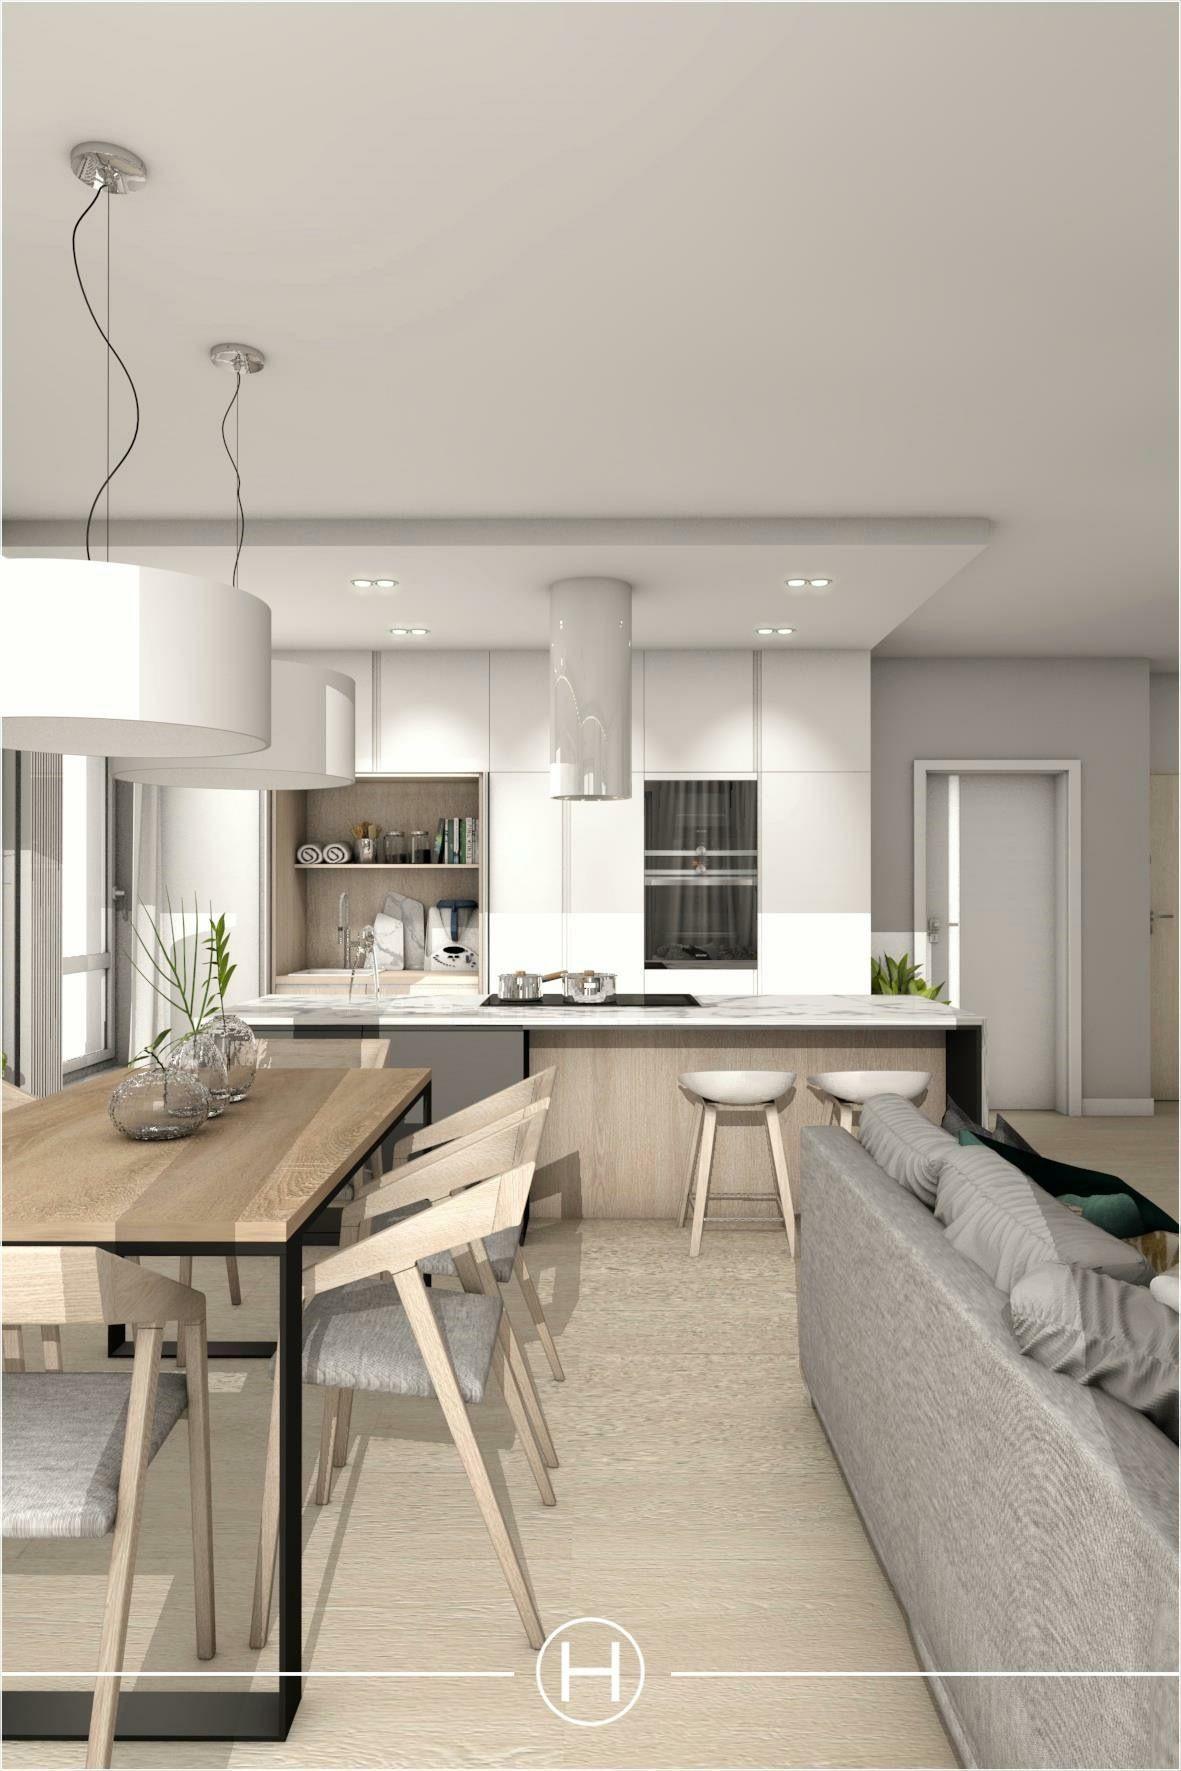 Pin szerz je balogh zs fia k zz t ve itt konyha meuble design d co maison s id e d co maison - Comptoir cuisine americaine ...